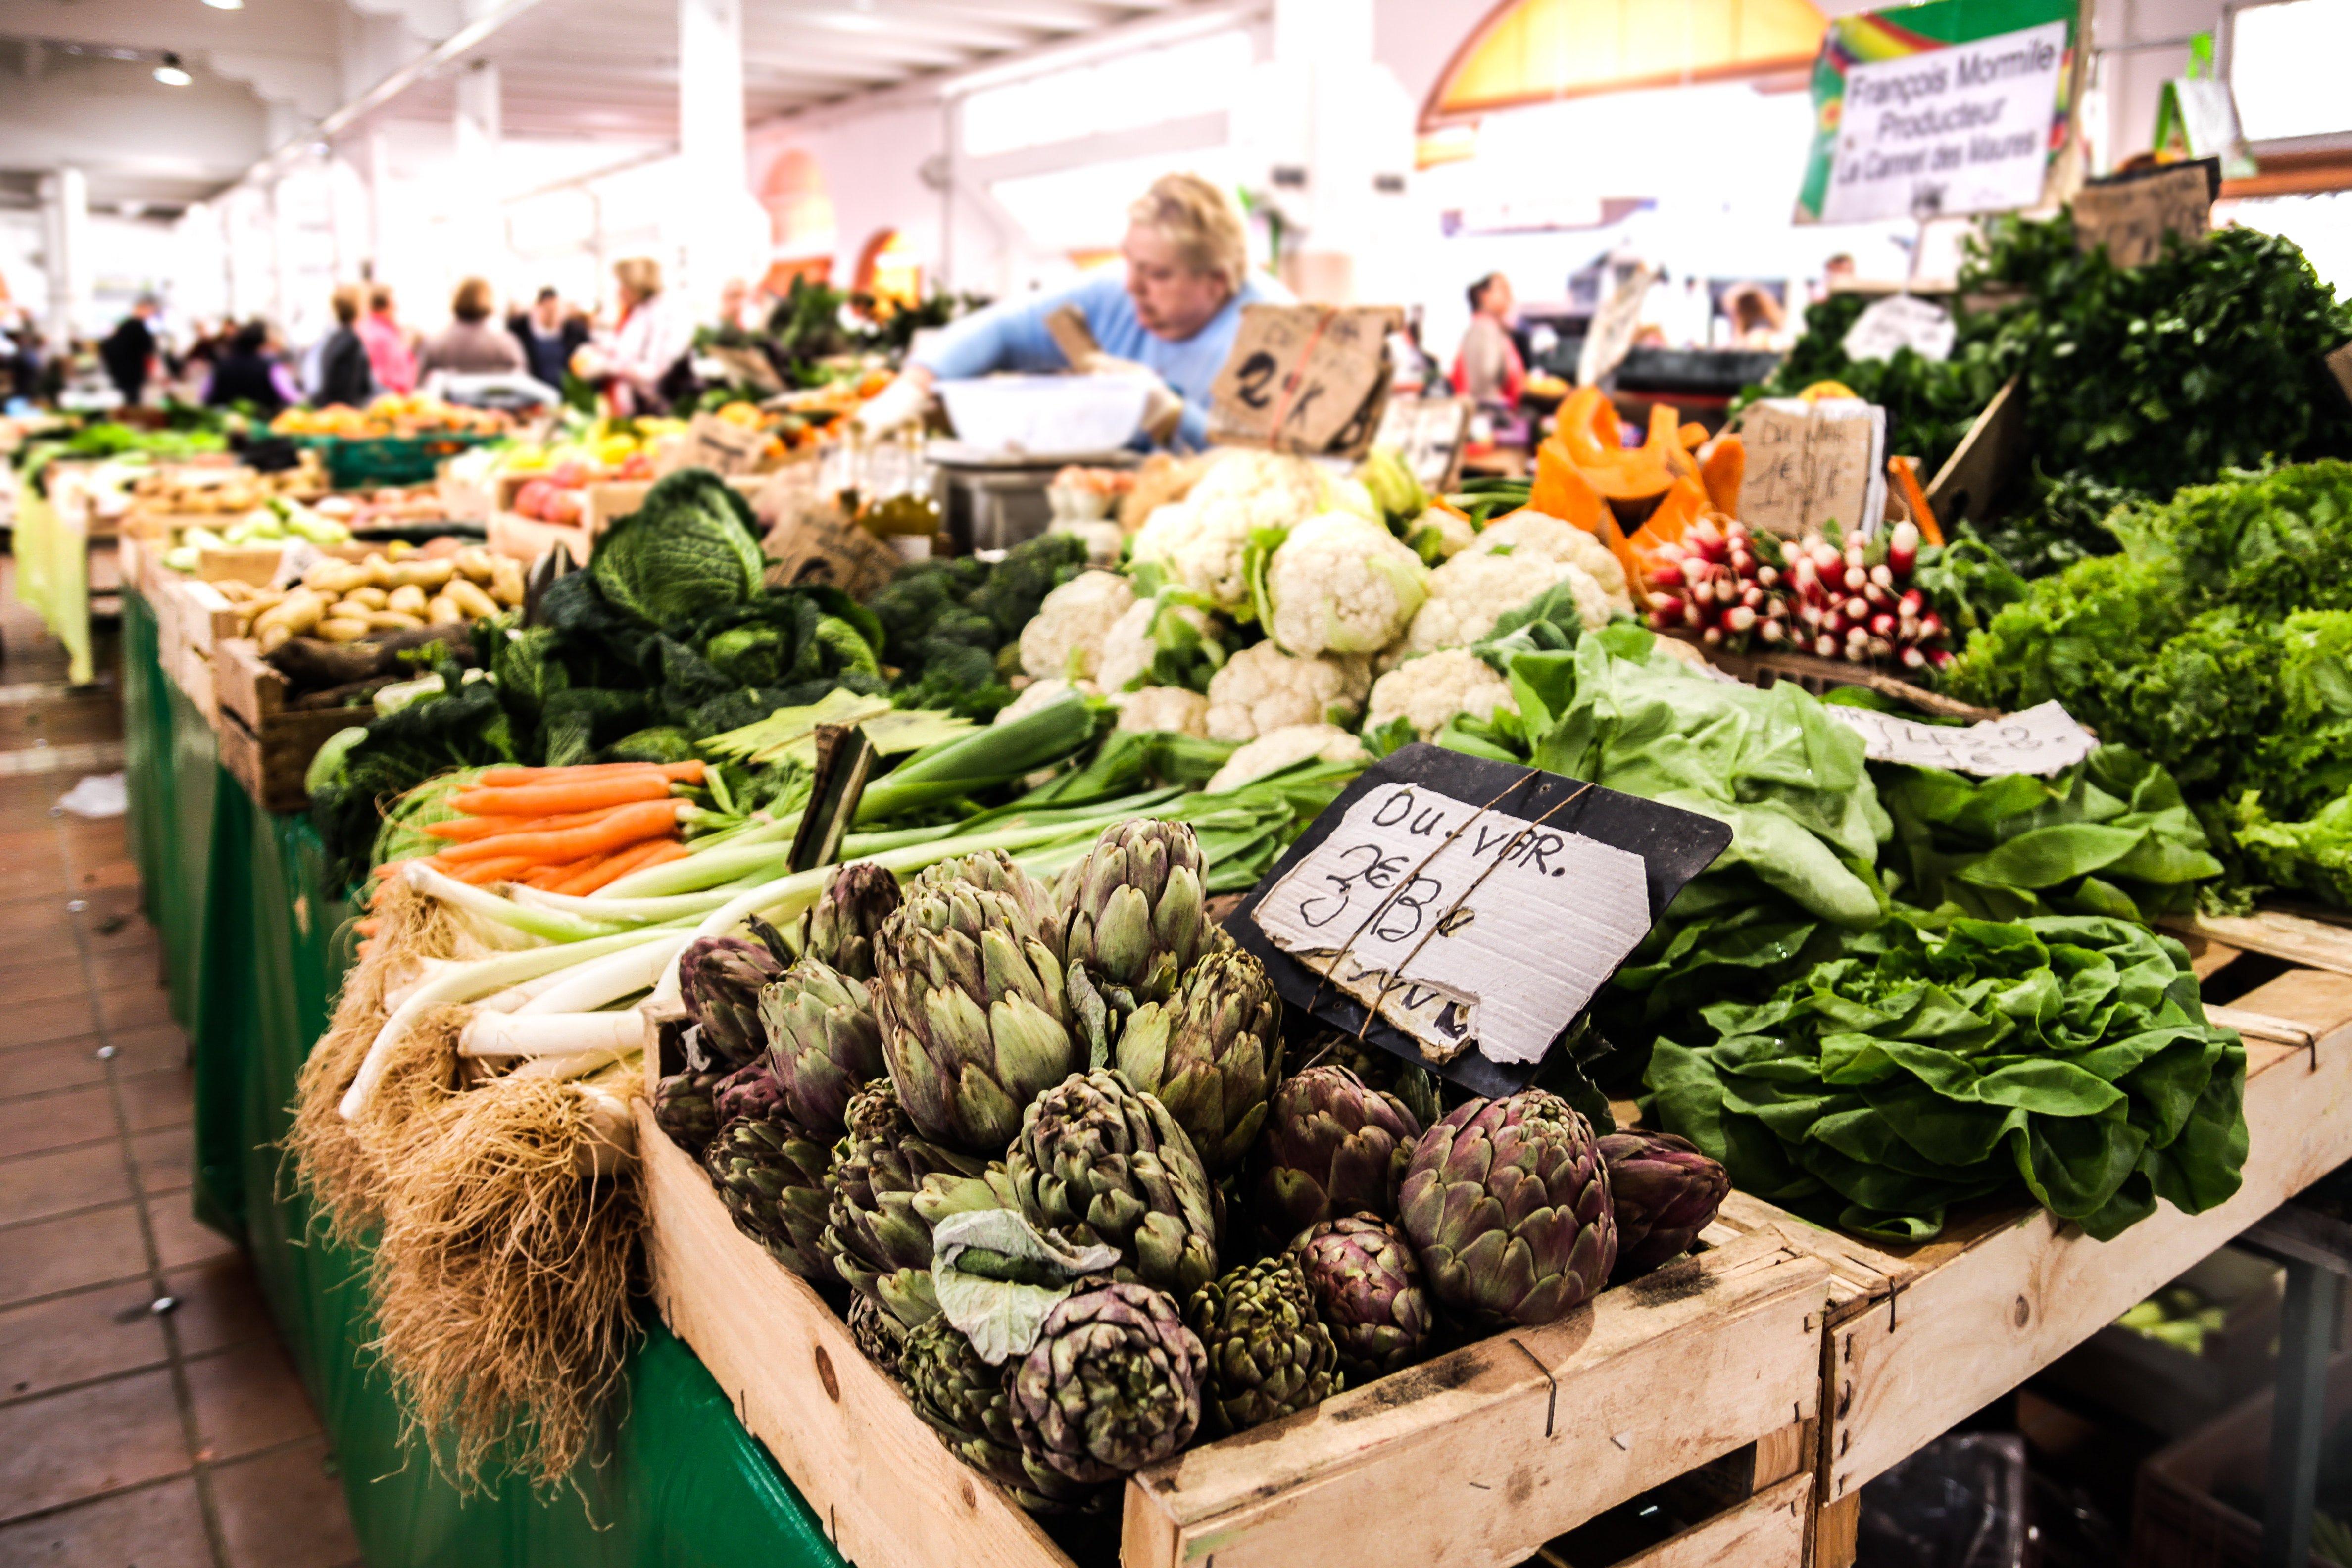 Food and Environmental Desensitization